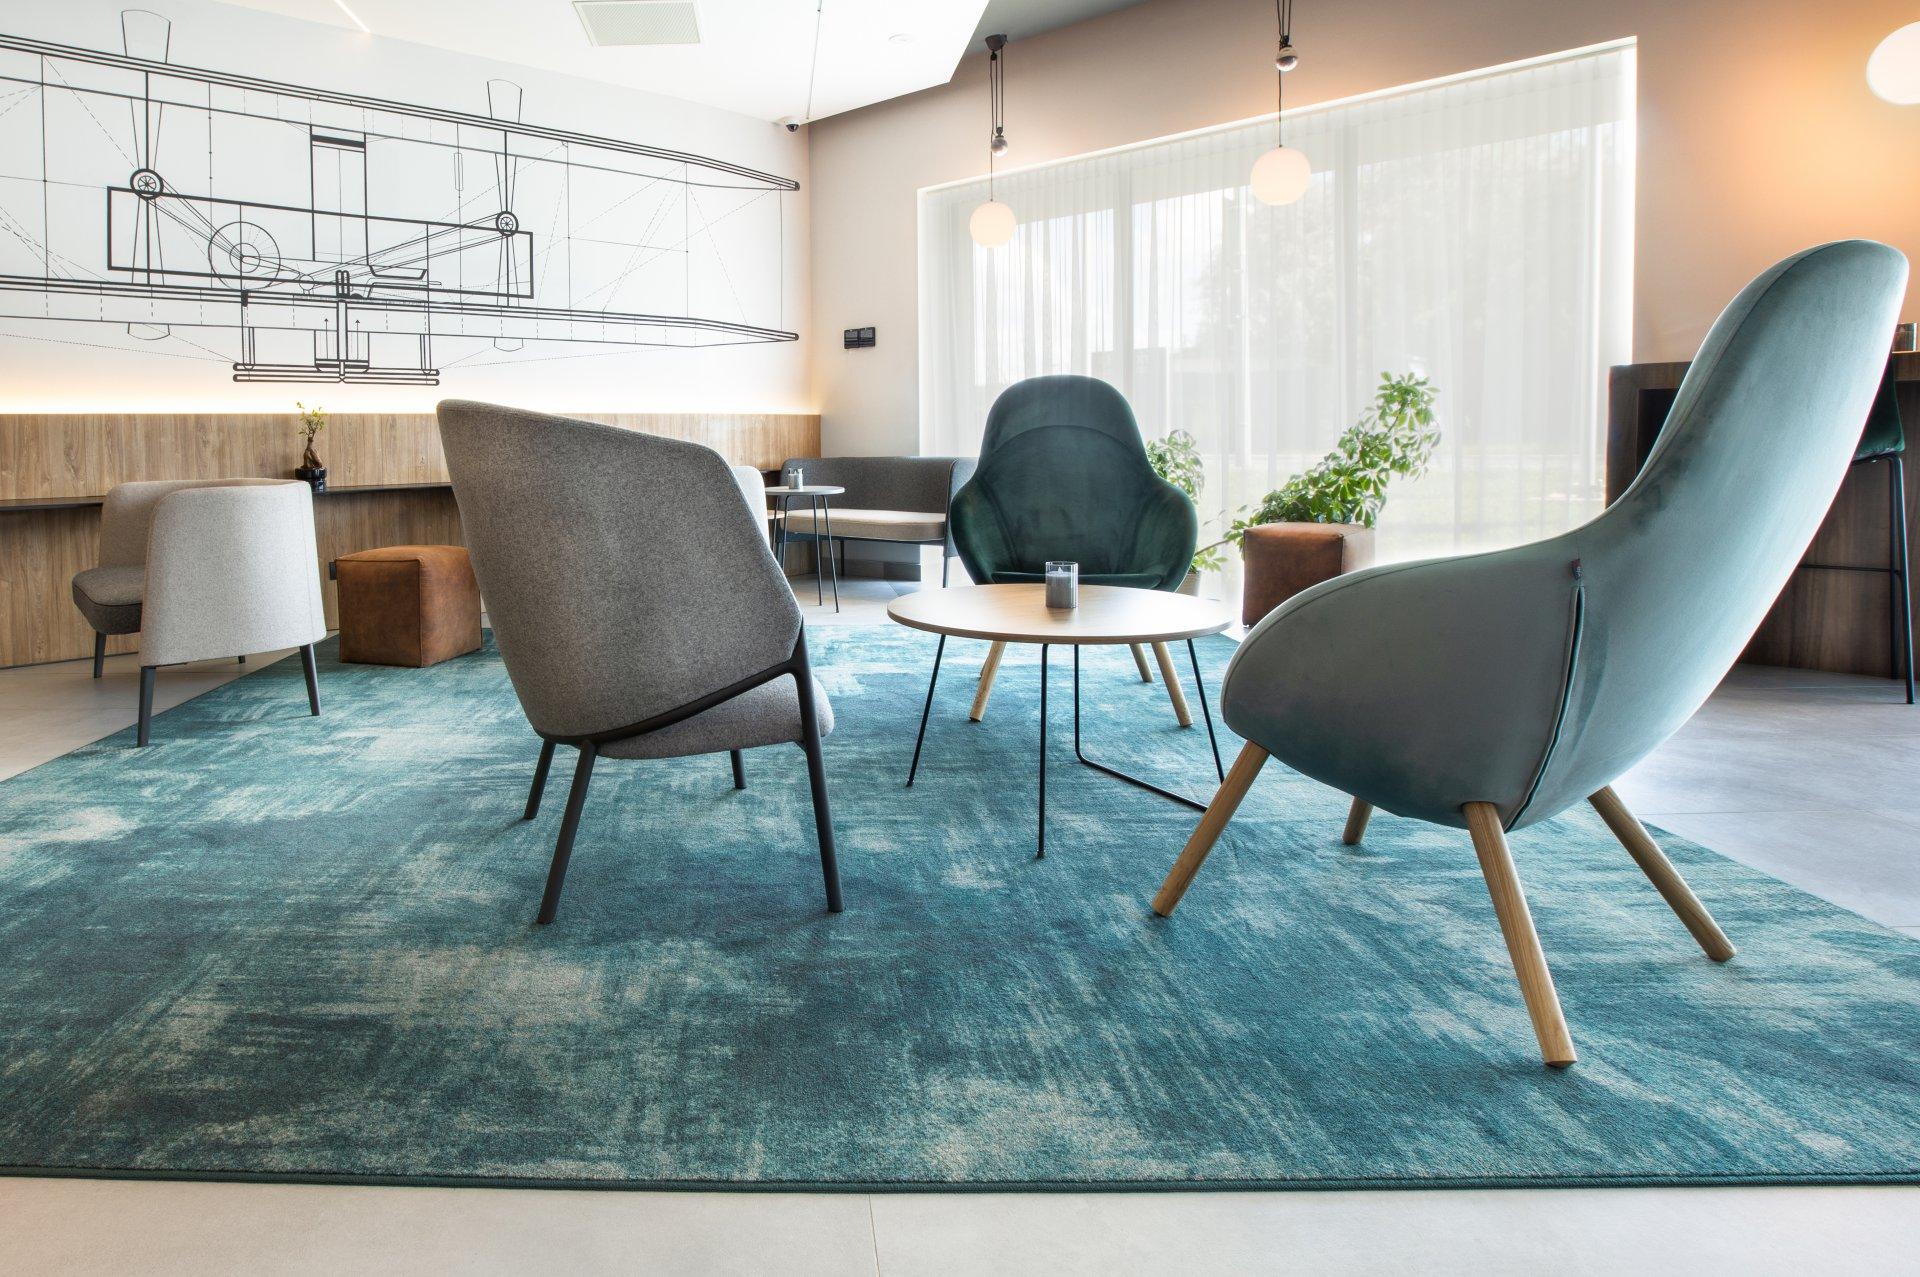 20200625-carpet-and-more-hilton-otopeni-22